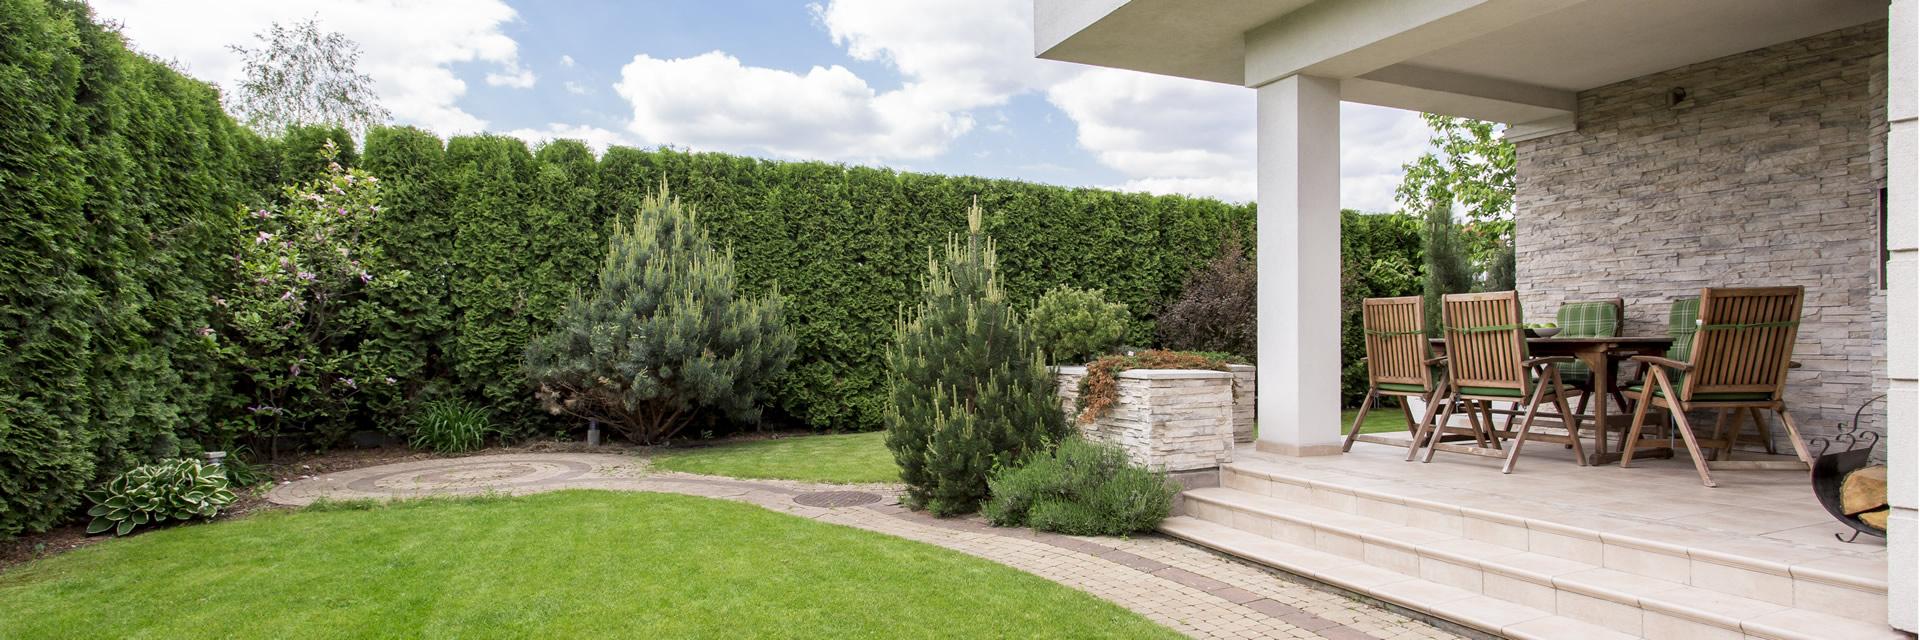 17.SIMPHOME.COM down to earth gardens landscape design victoria bc with backyard landscape design tool